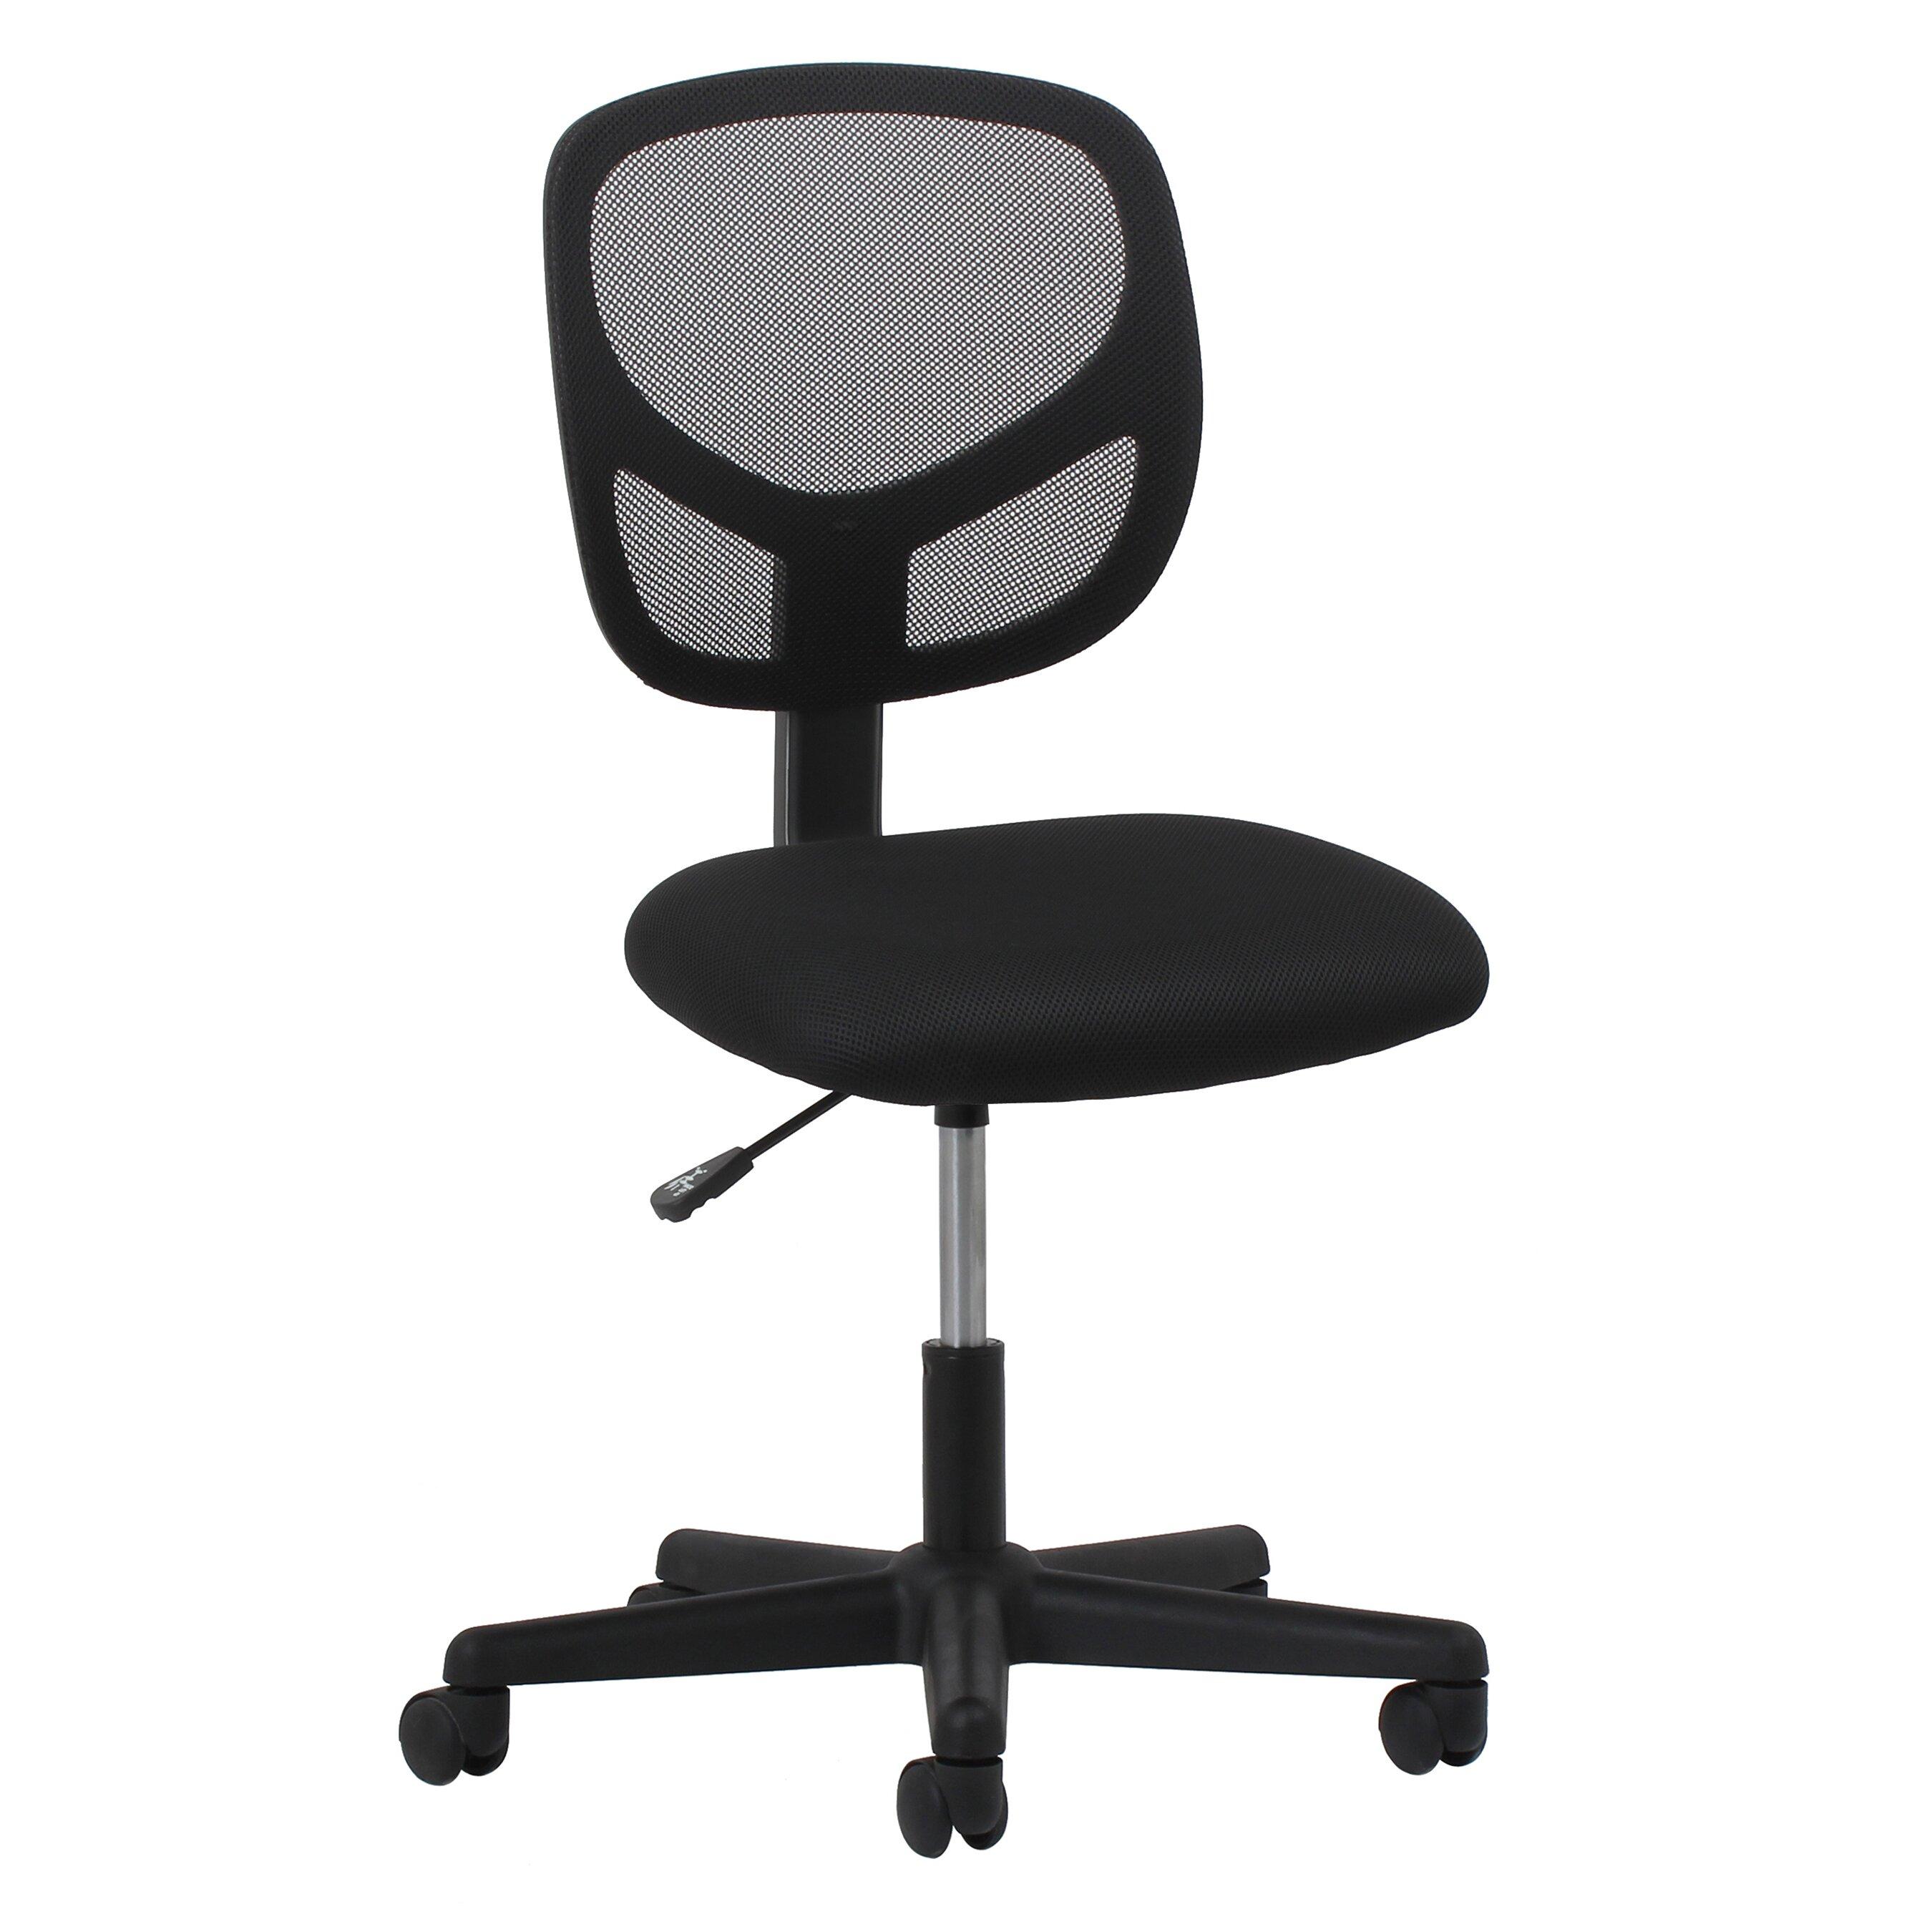 ofm essentials mid back mesh desk chair reviews wayfair. Black Bedroom Furniture Sets. Home Design Ideas